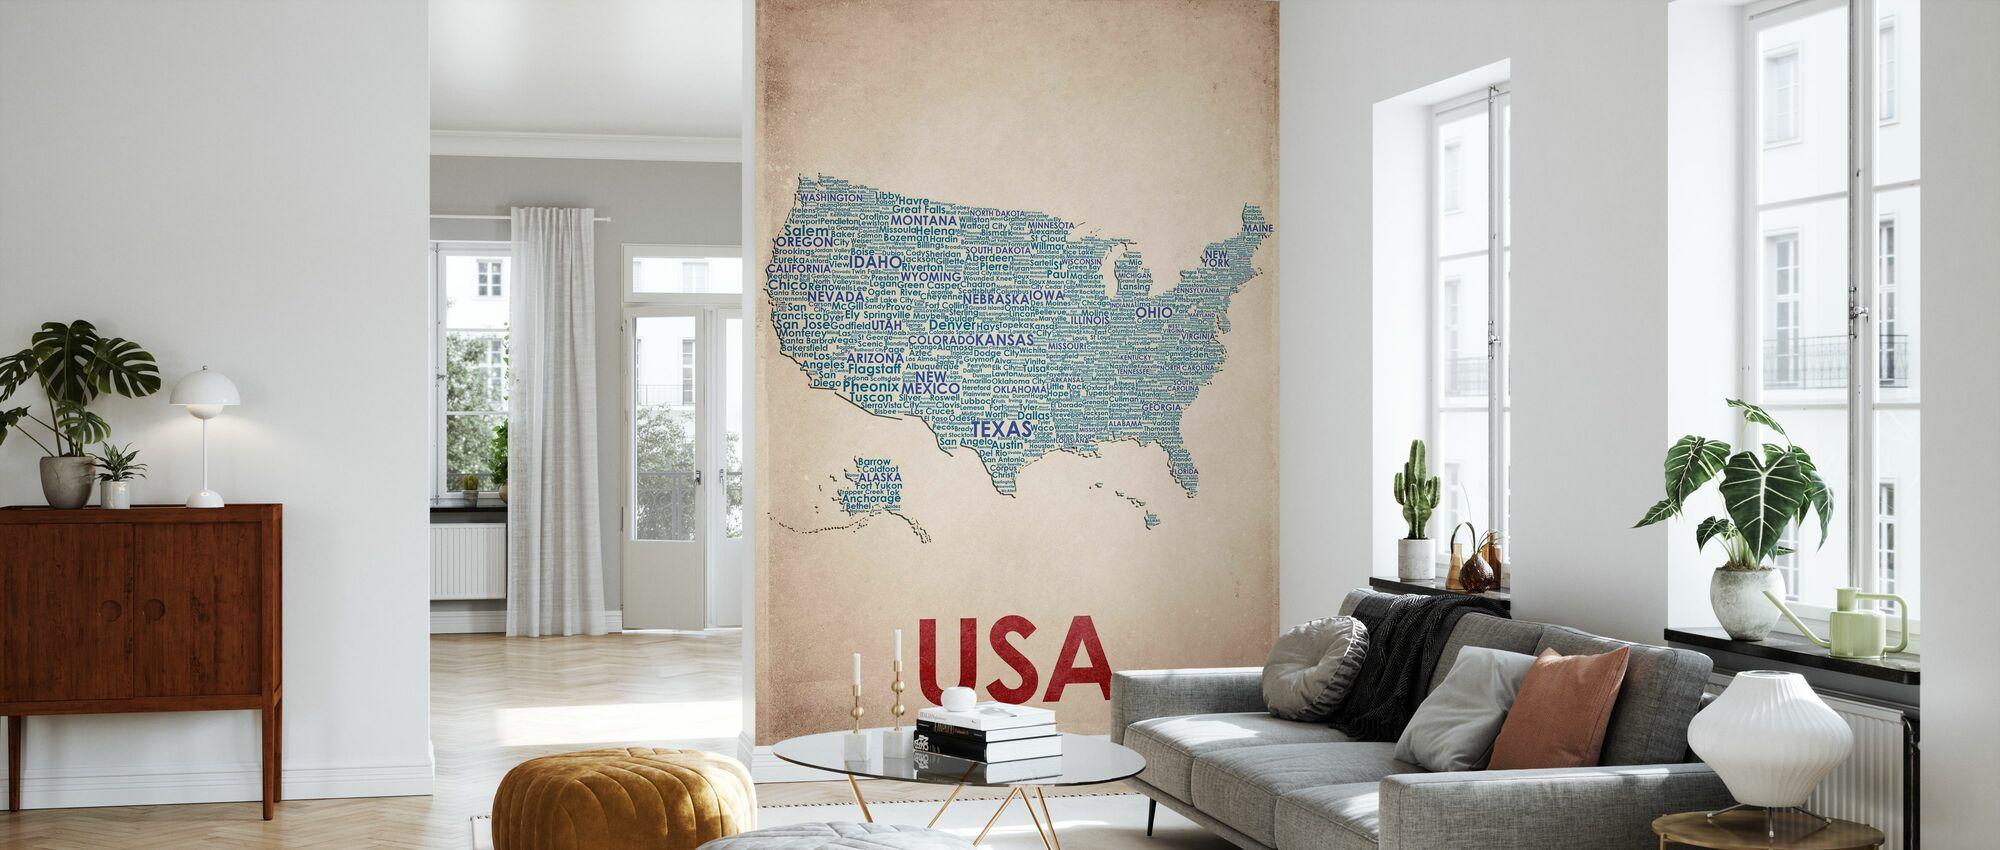 USA Map - Wallpaper - Living Room